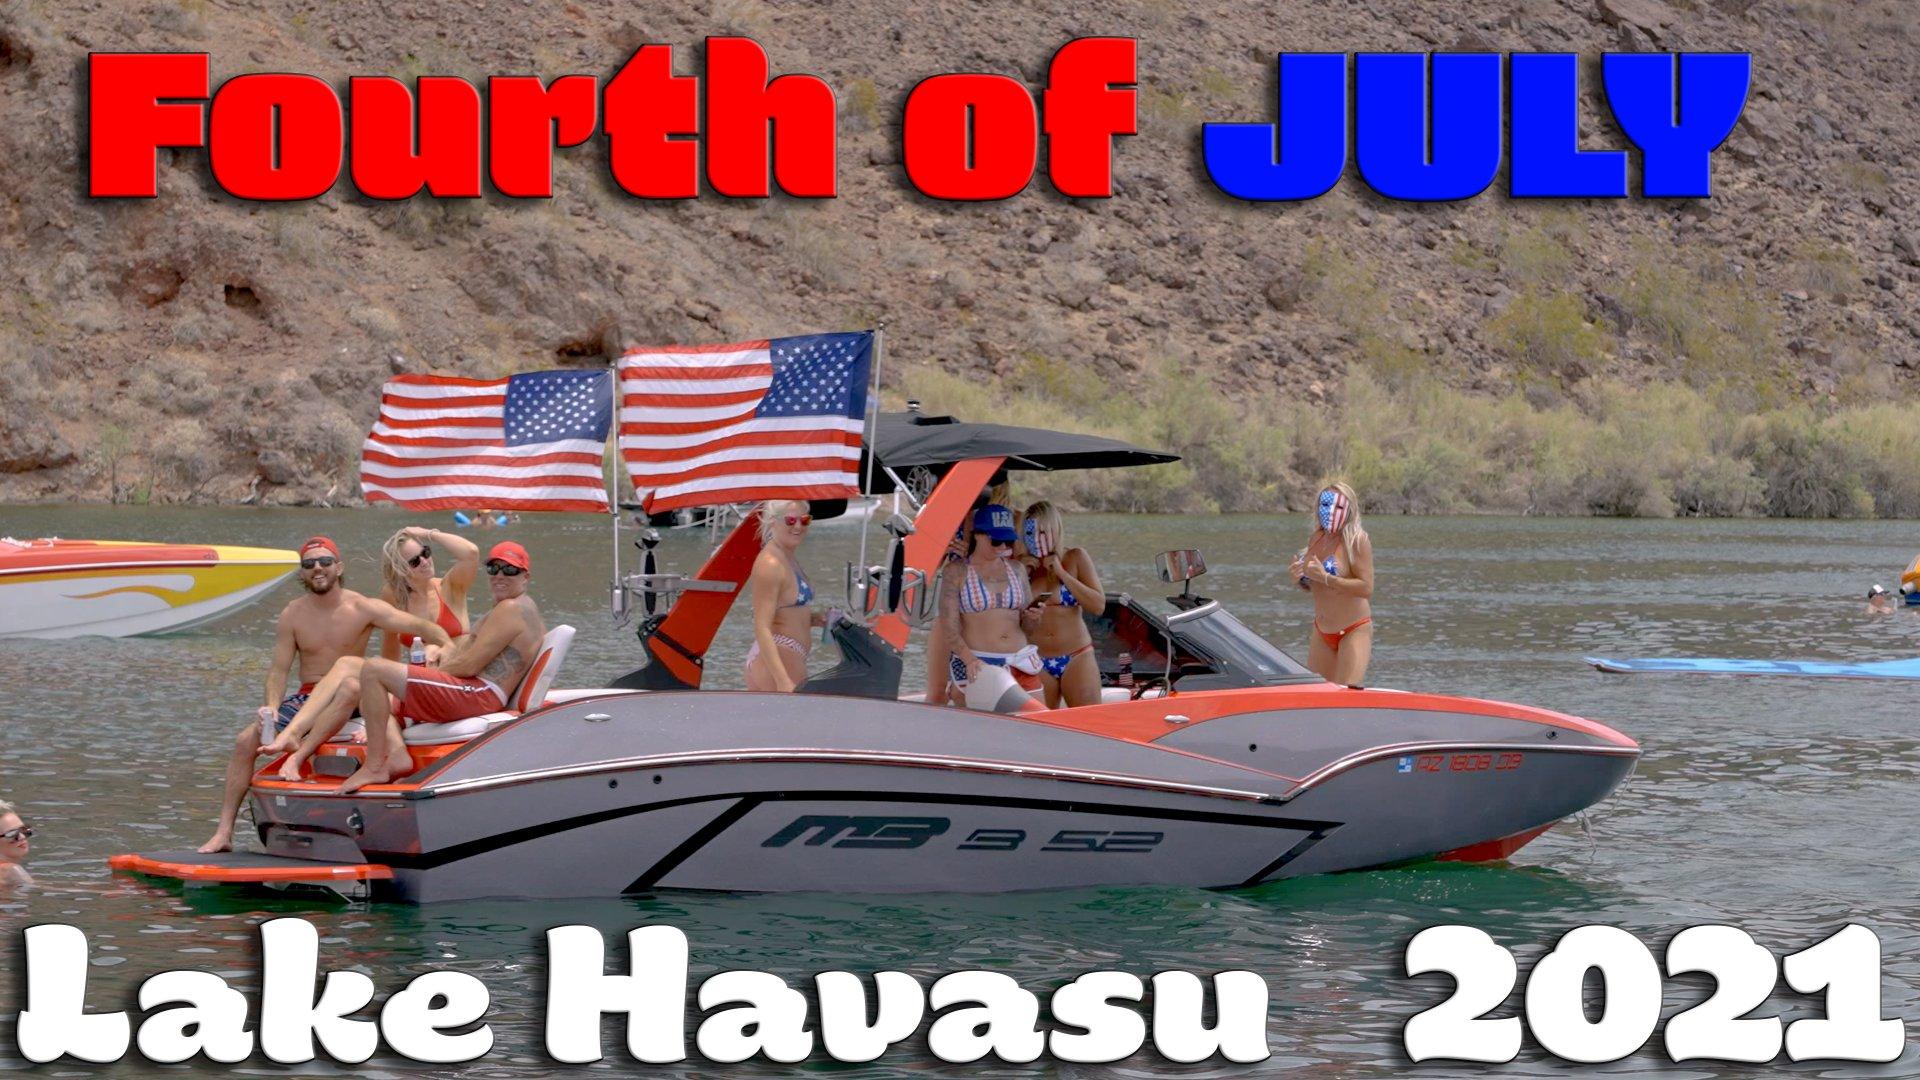 Boating July 4th Thumb.jpg